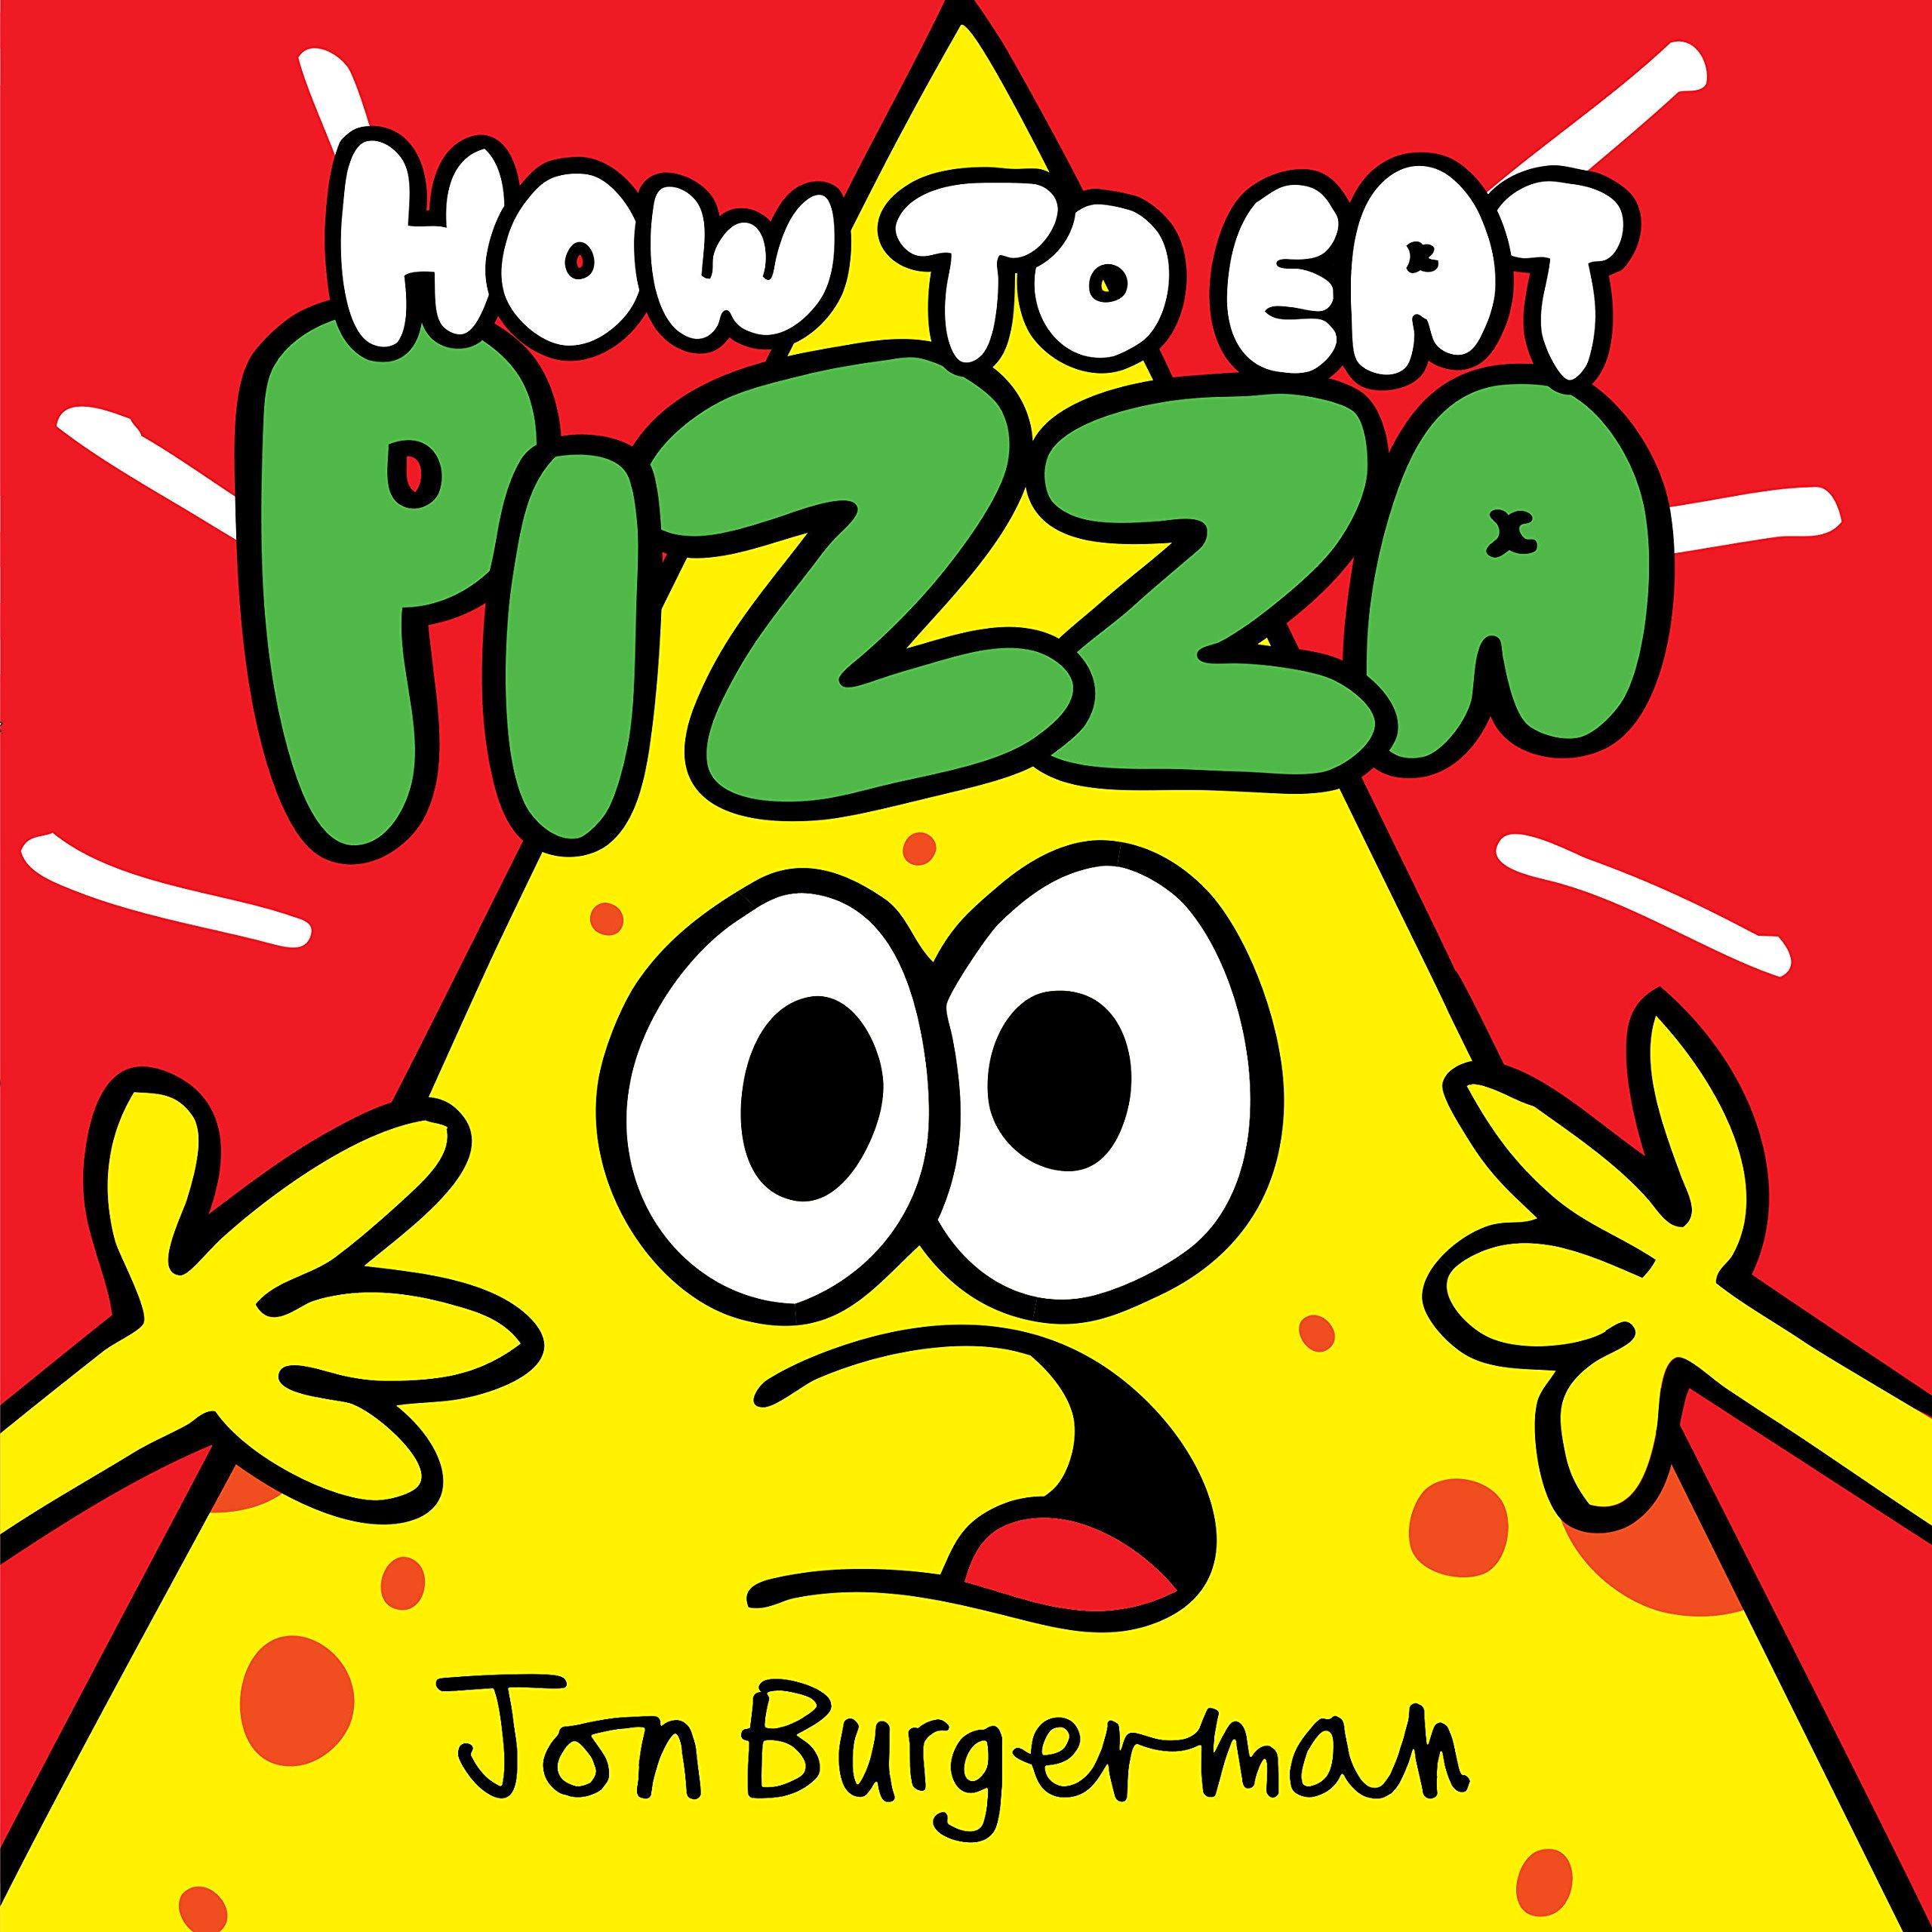 How To Eat Pizza Burgerman Jon 9780735228856 Amazon Com Books